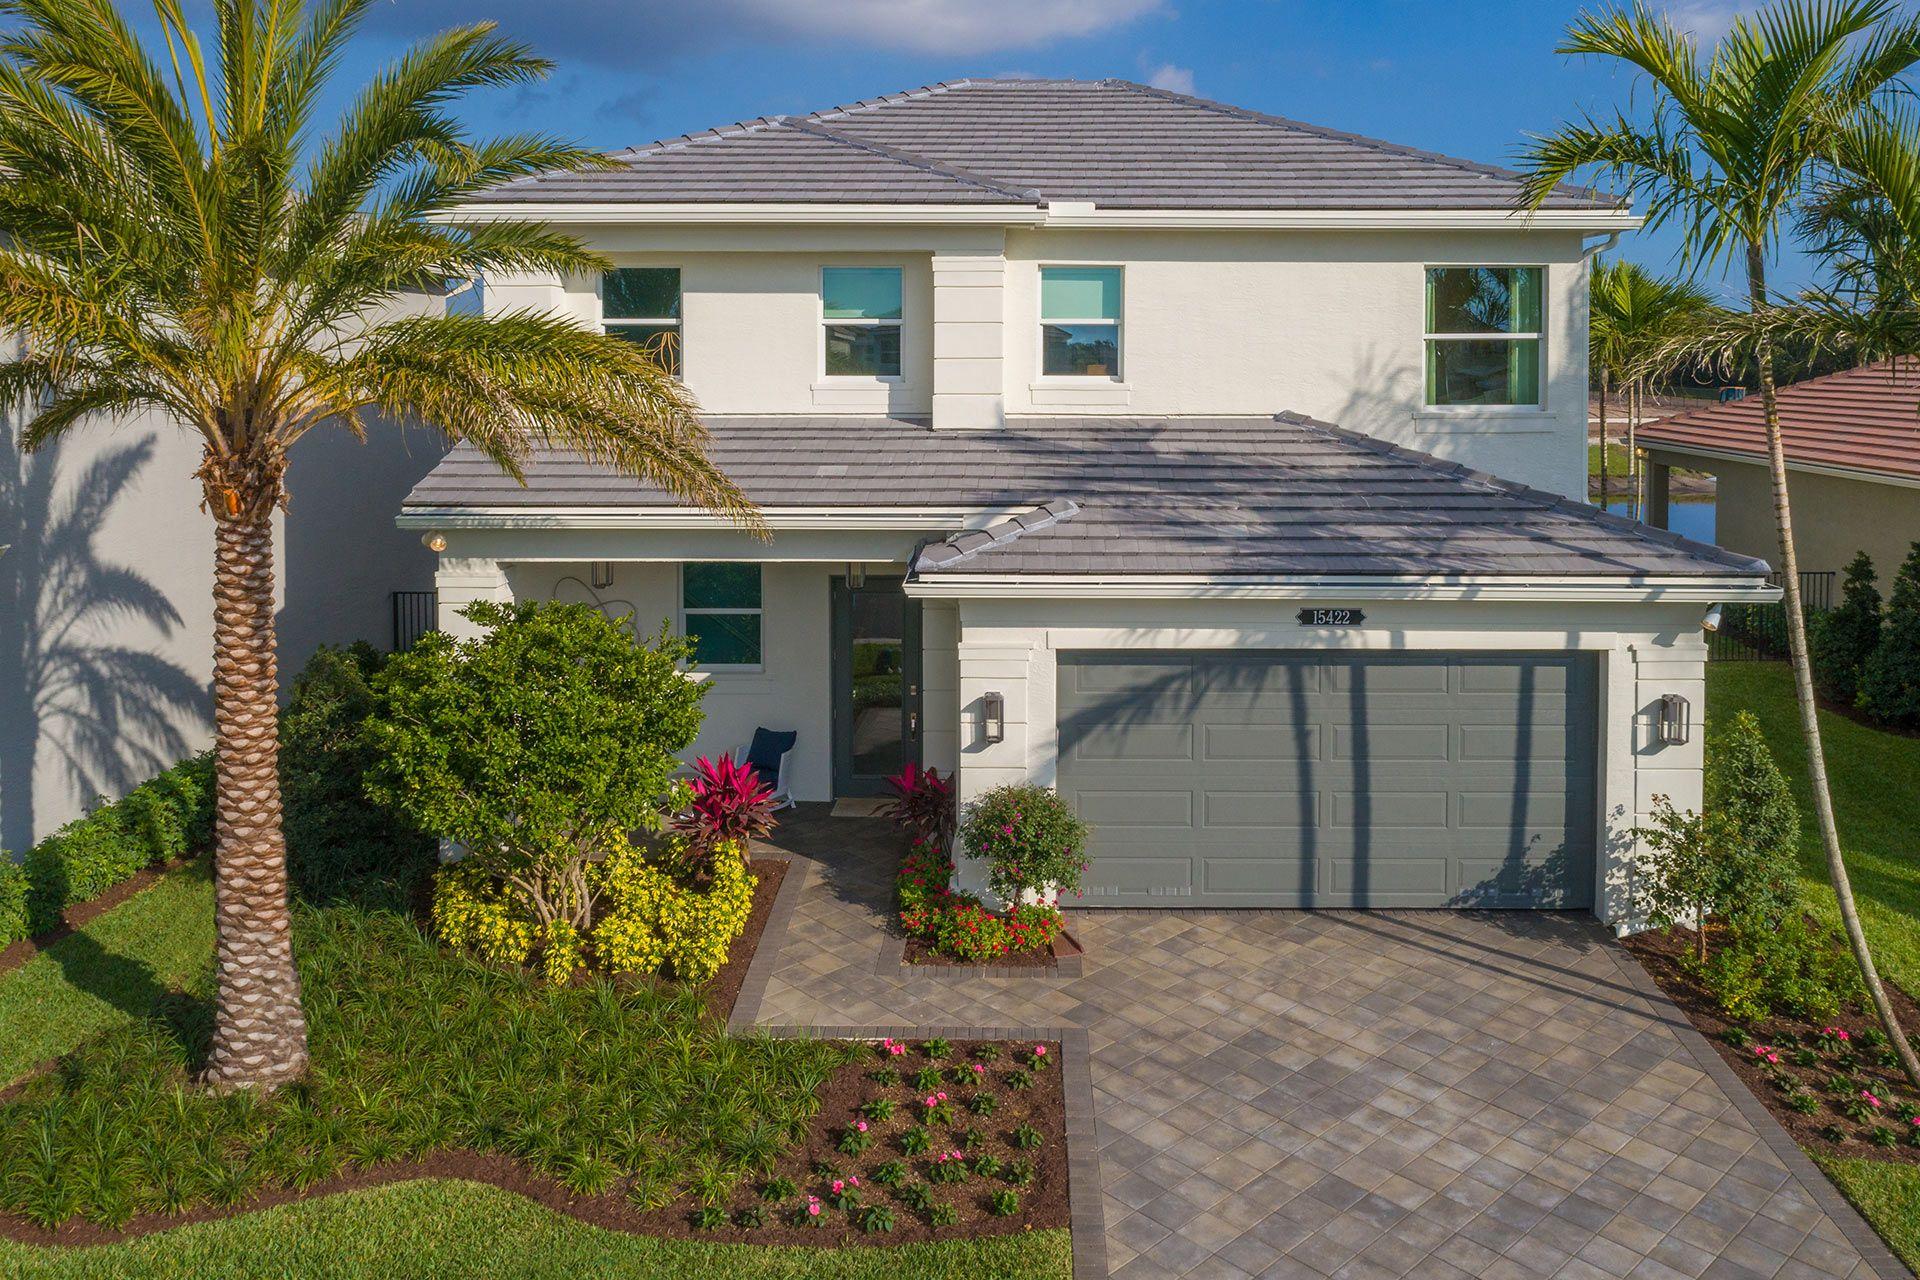 The Atlantic Grande Plan At Dakota In Delray Beach Florida Florida Real Estate Gl Home Florida Real Estate Shaker Style Interior Doors Delray Beach Florida